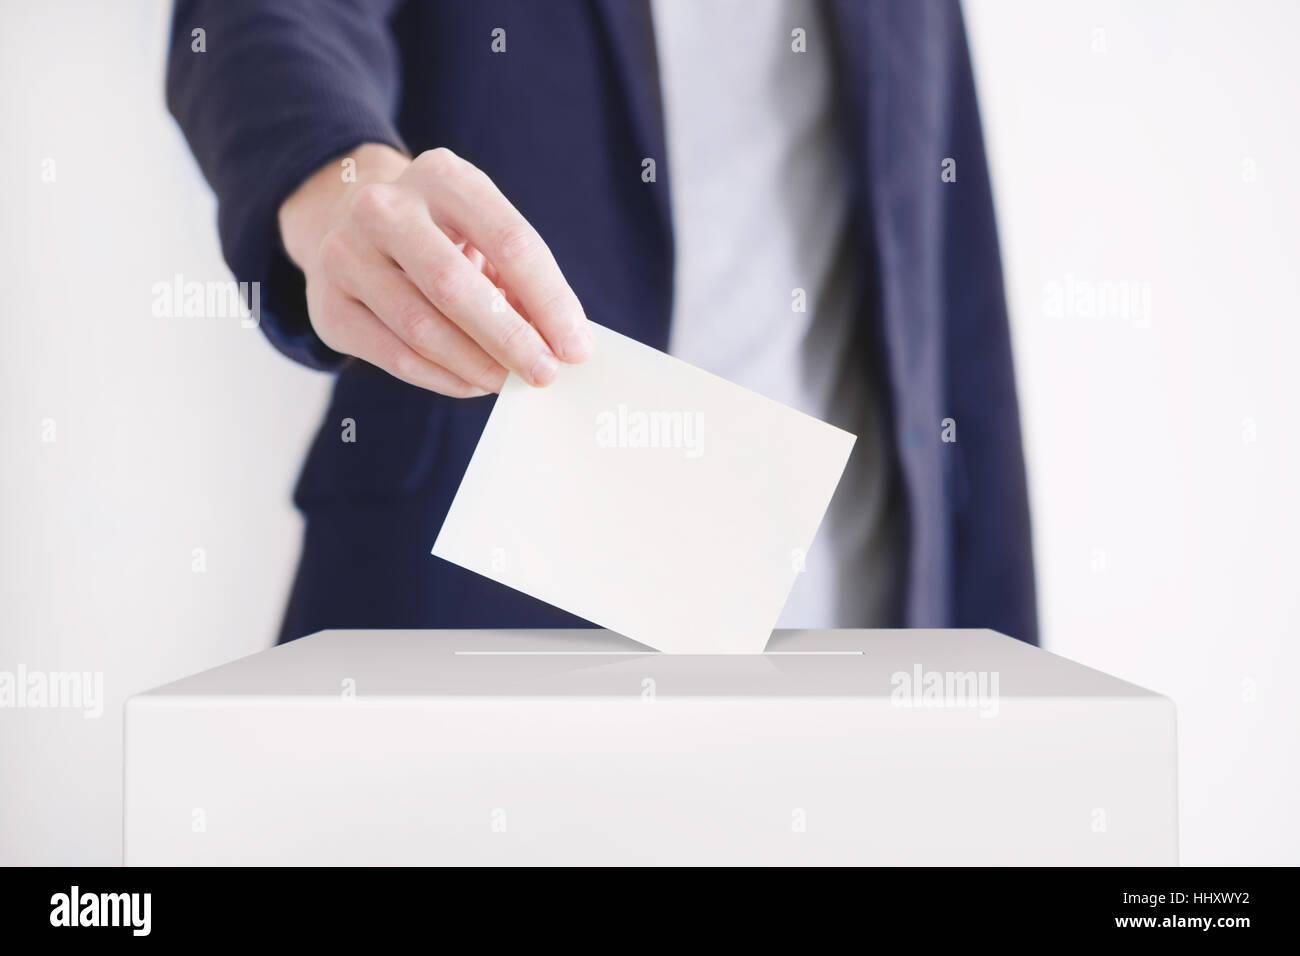 Man putting a ballot into a voting box. - Stock Image